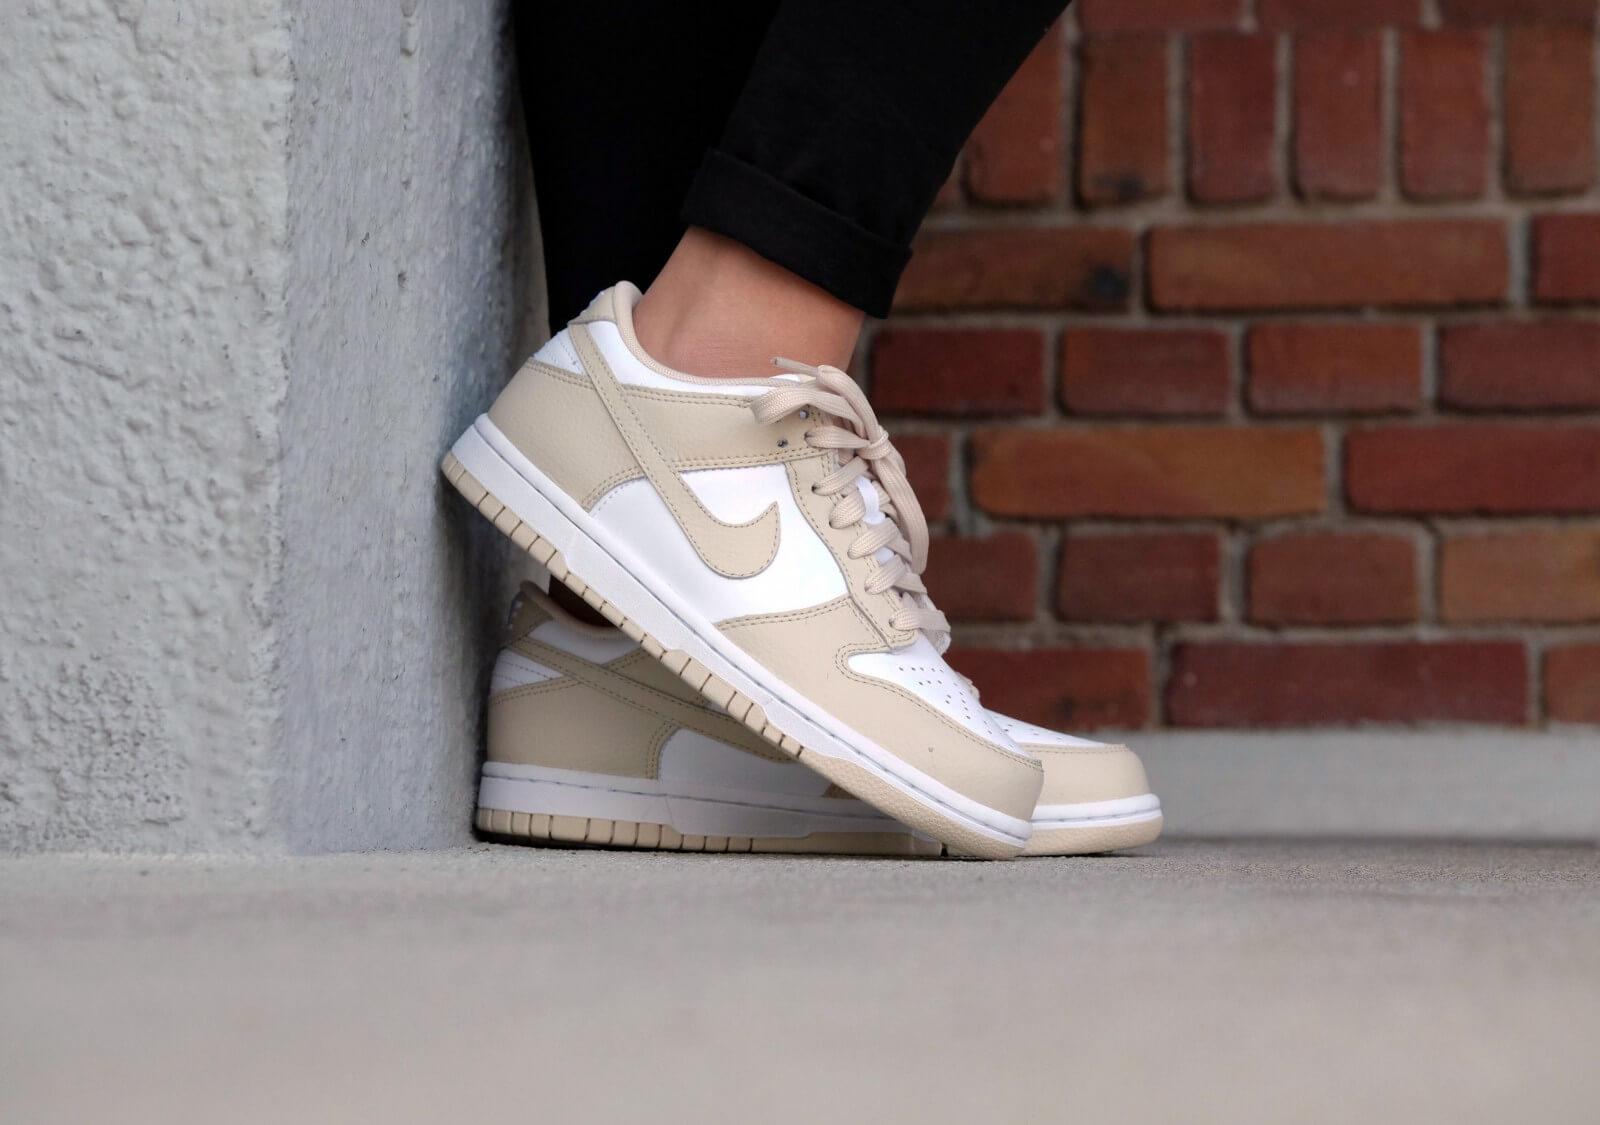 Nike WMNS Dunk Low White/Oatmeal